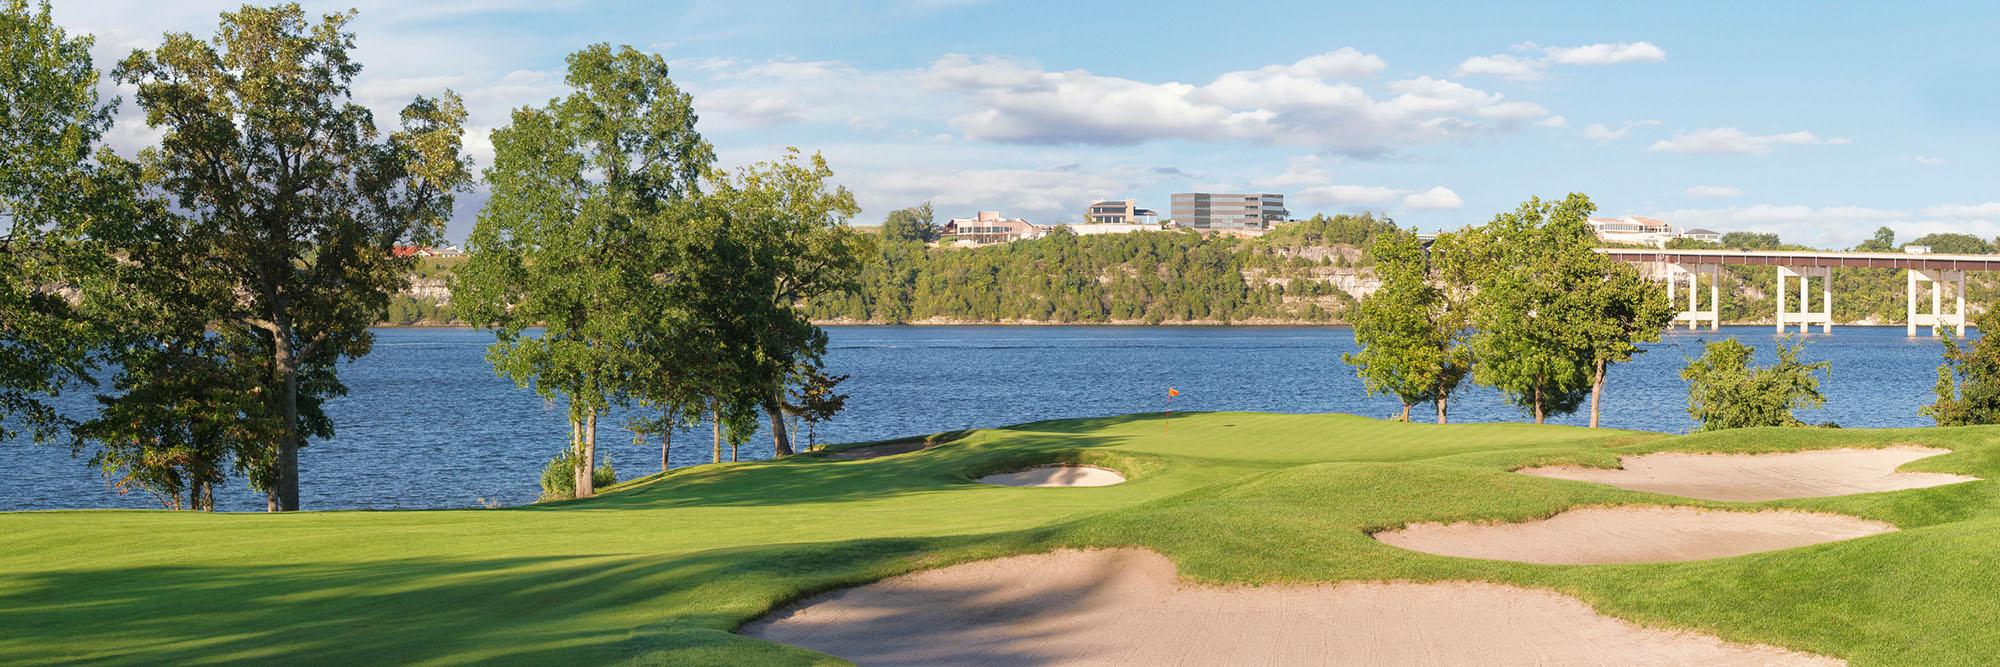 Golf Course Image - The Club at Porto Cima No. 15